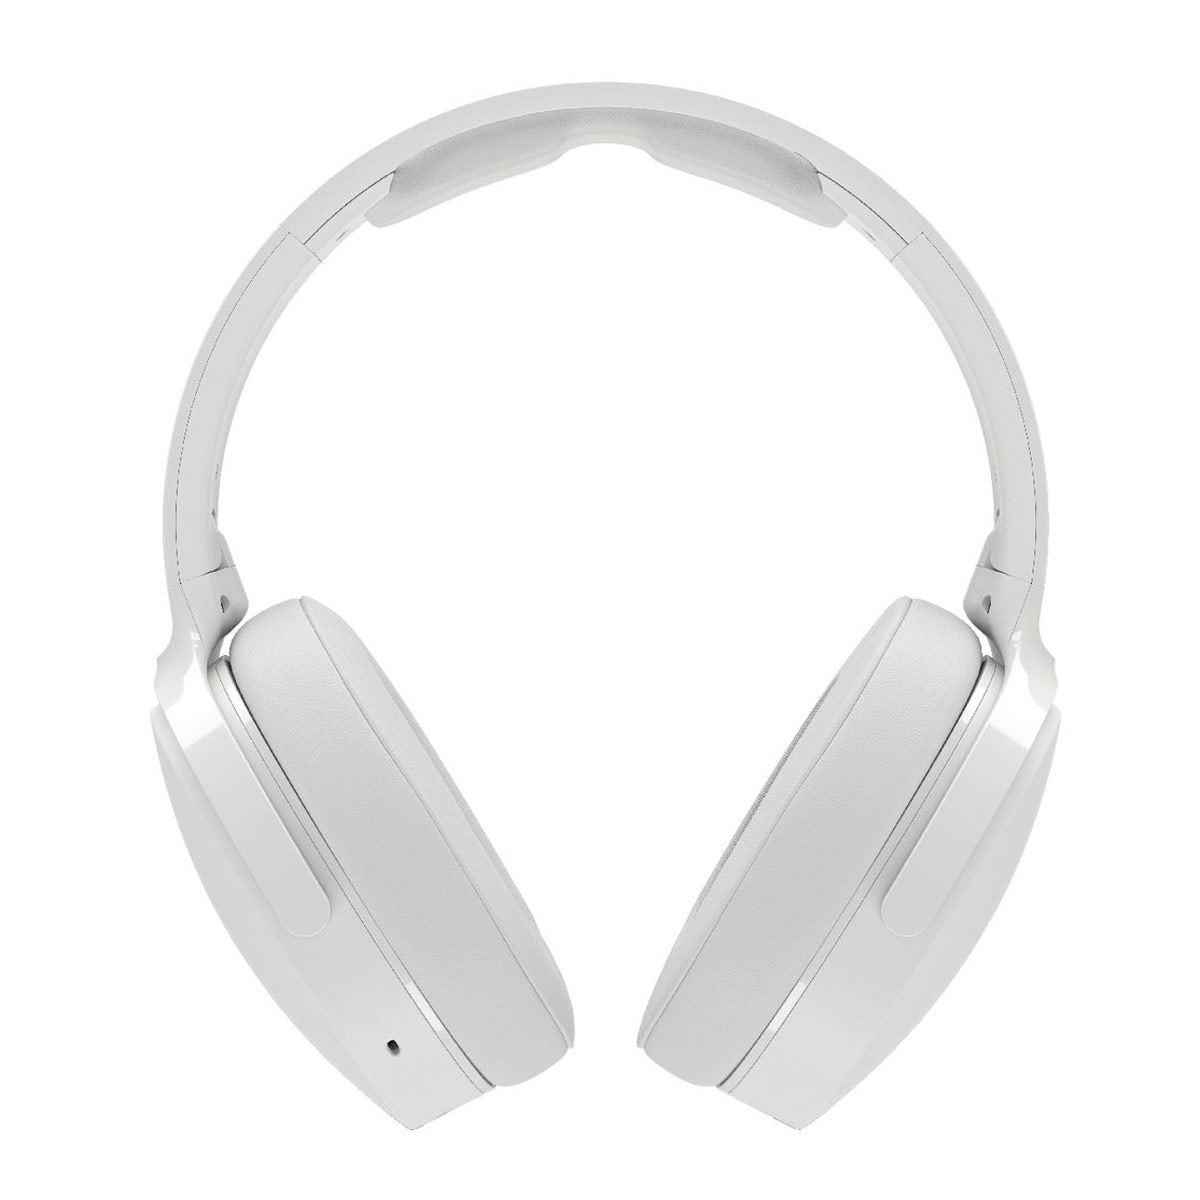 Audífonos Hesh 3 Bt Blanco Skullcandy